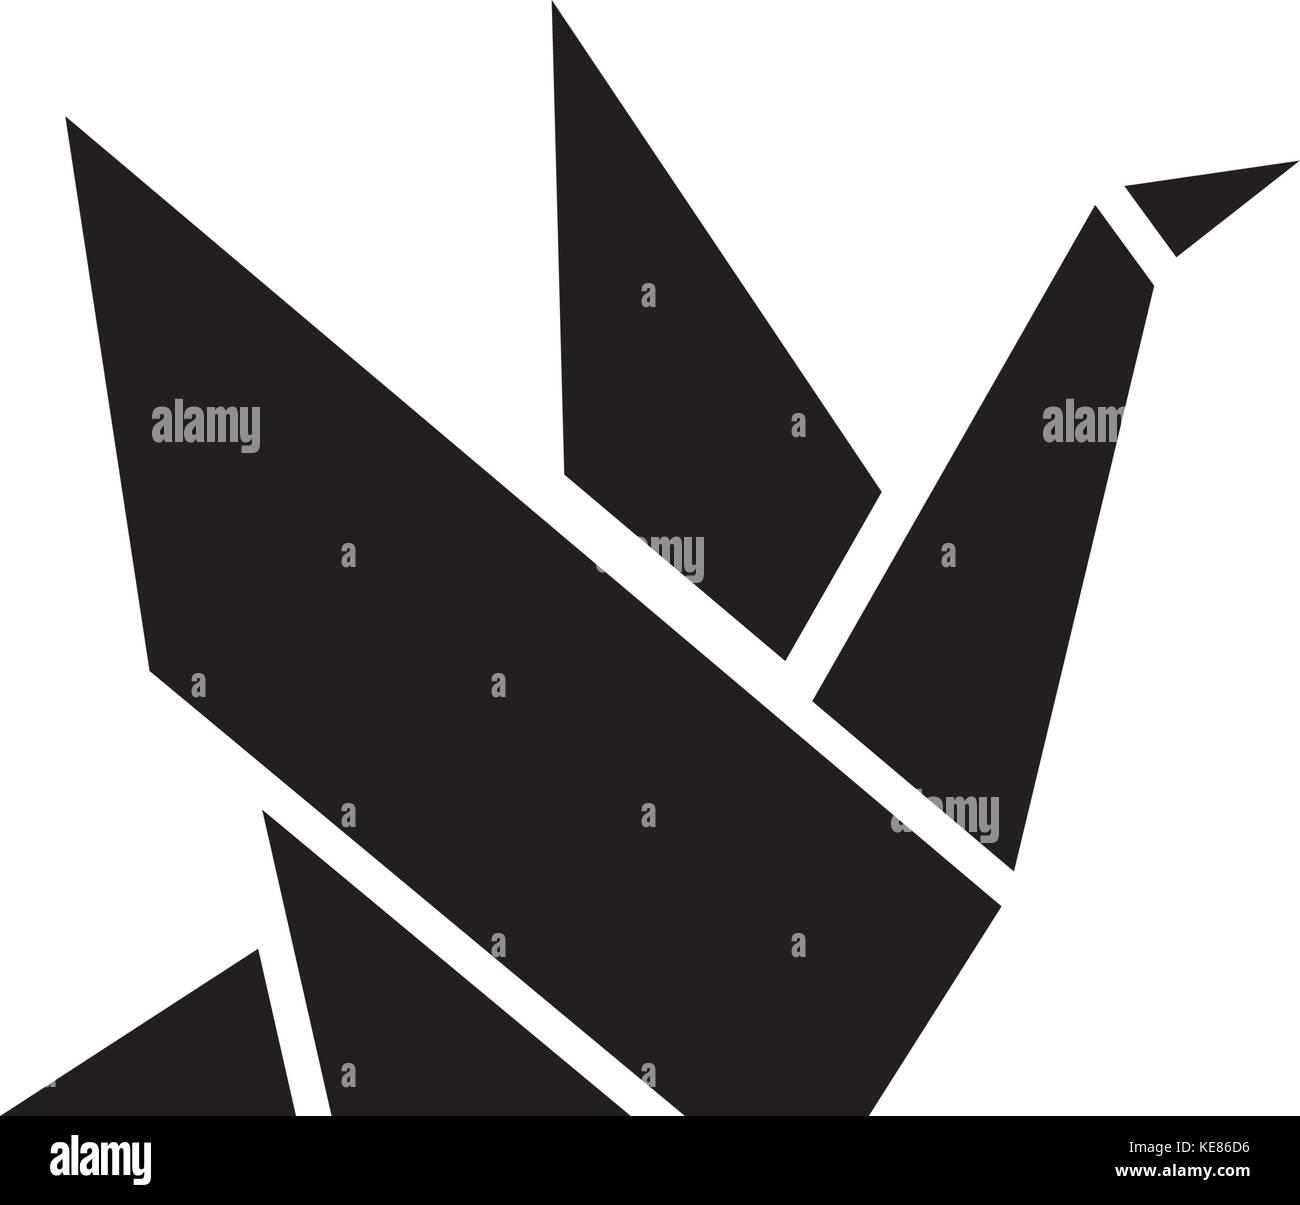 Origami icon vector illustration black sign on isolated origami icon vector illustration black sign on isolated background jeuxipadfo Gallery